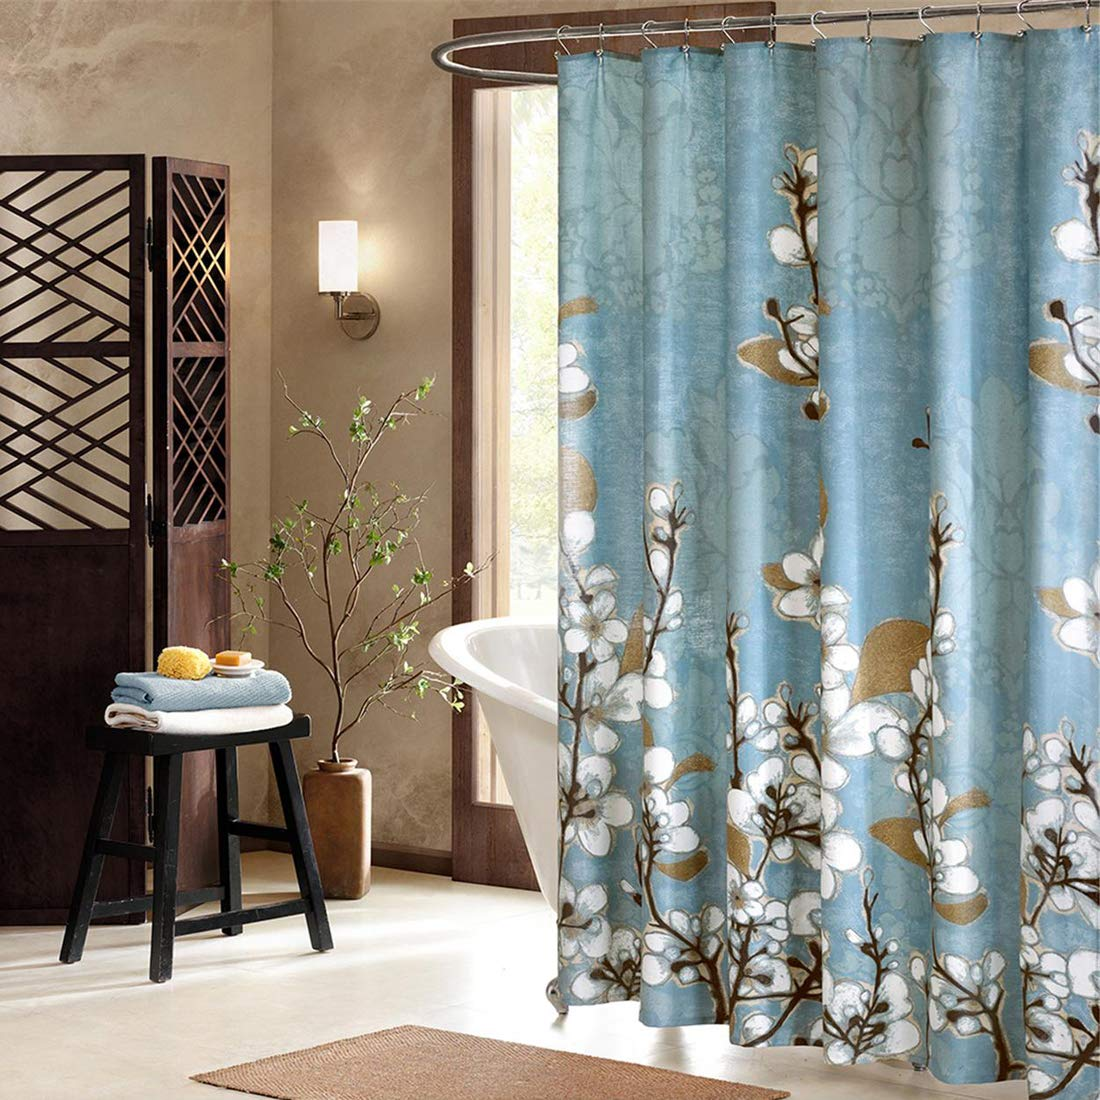 DS BATH Hanakotoba Blue Shower Curtain,Flower Polyester Fabric Shower Curtain,Plants Shower Curtains for Bathroom,Floral Bathroom Curtains,Print Waterproof Shower Curtain,94'' W x 78'' H